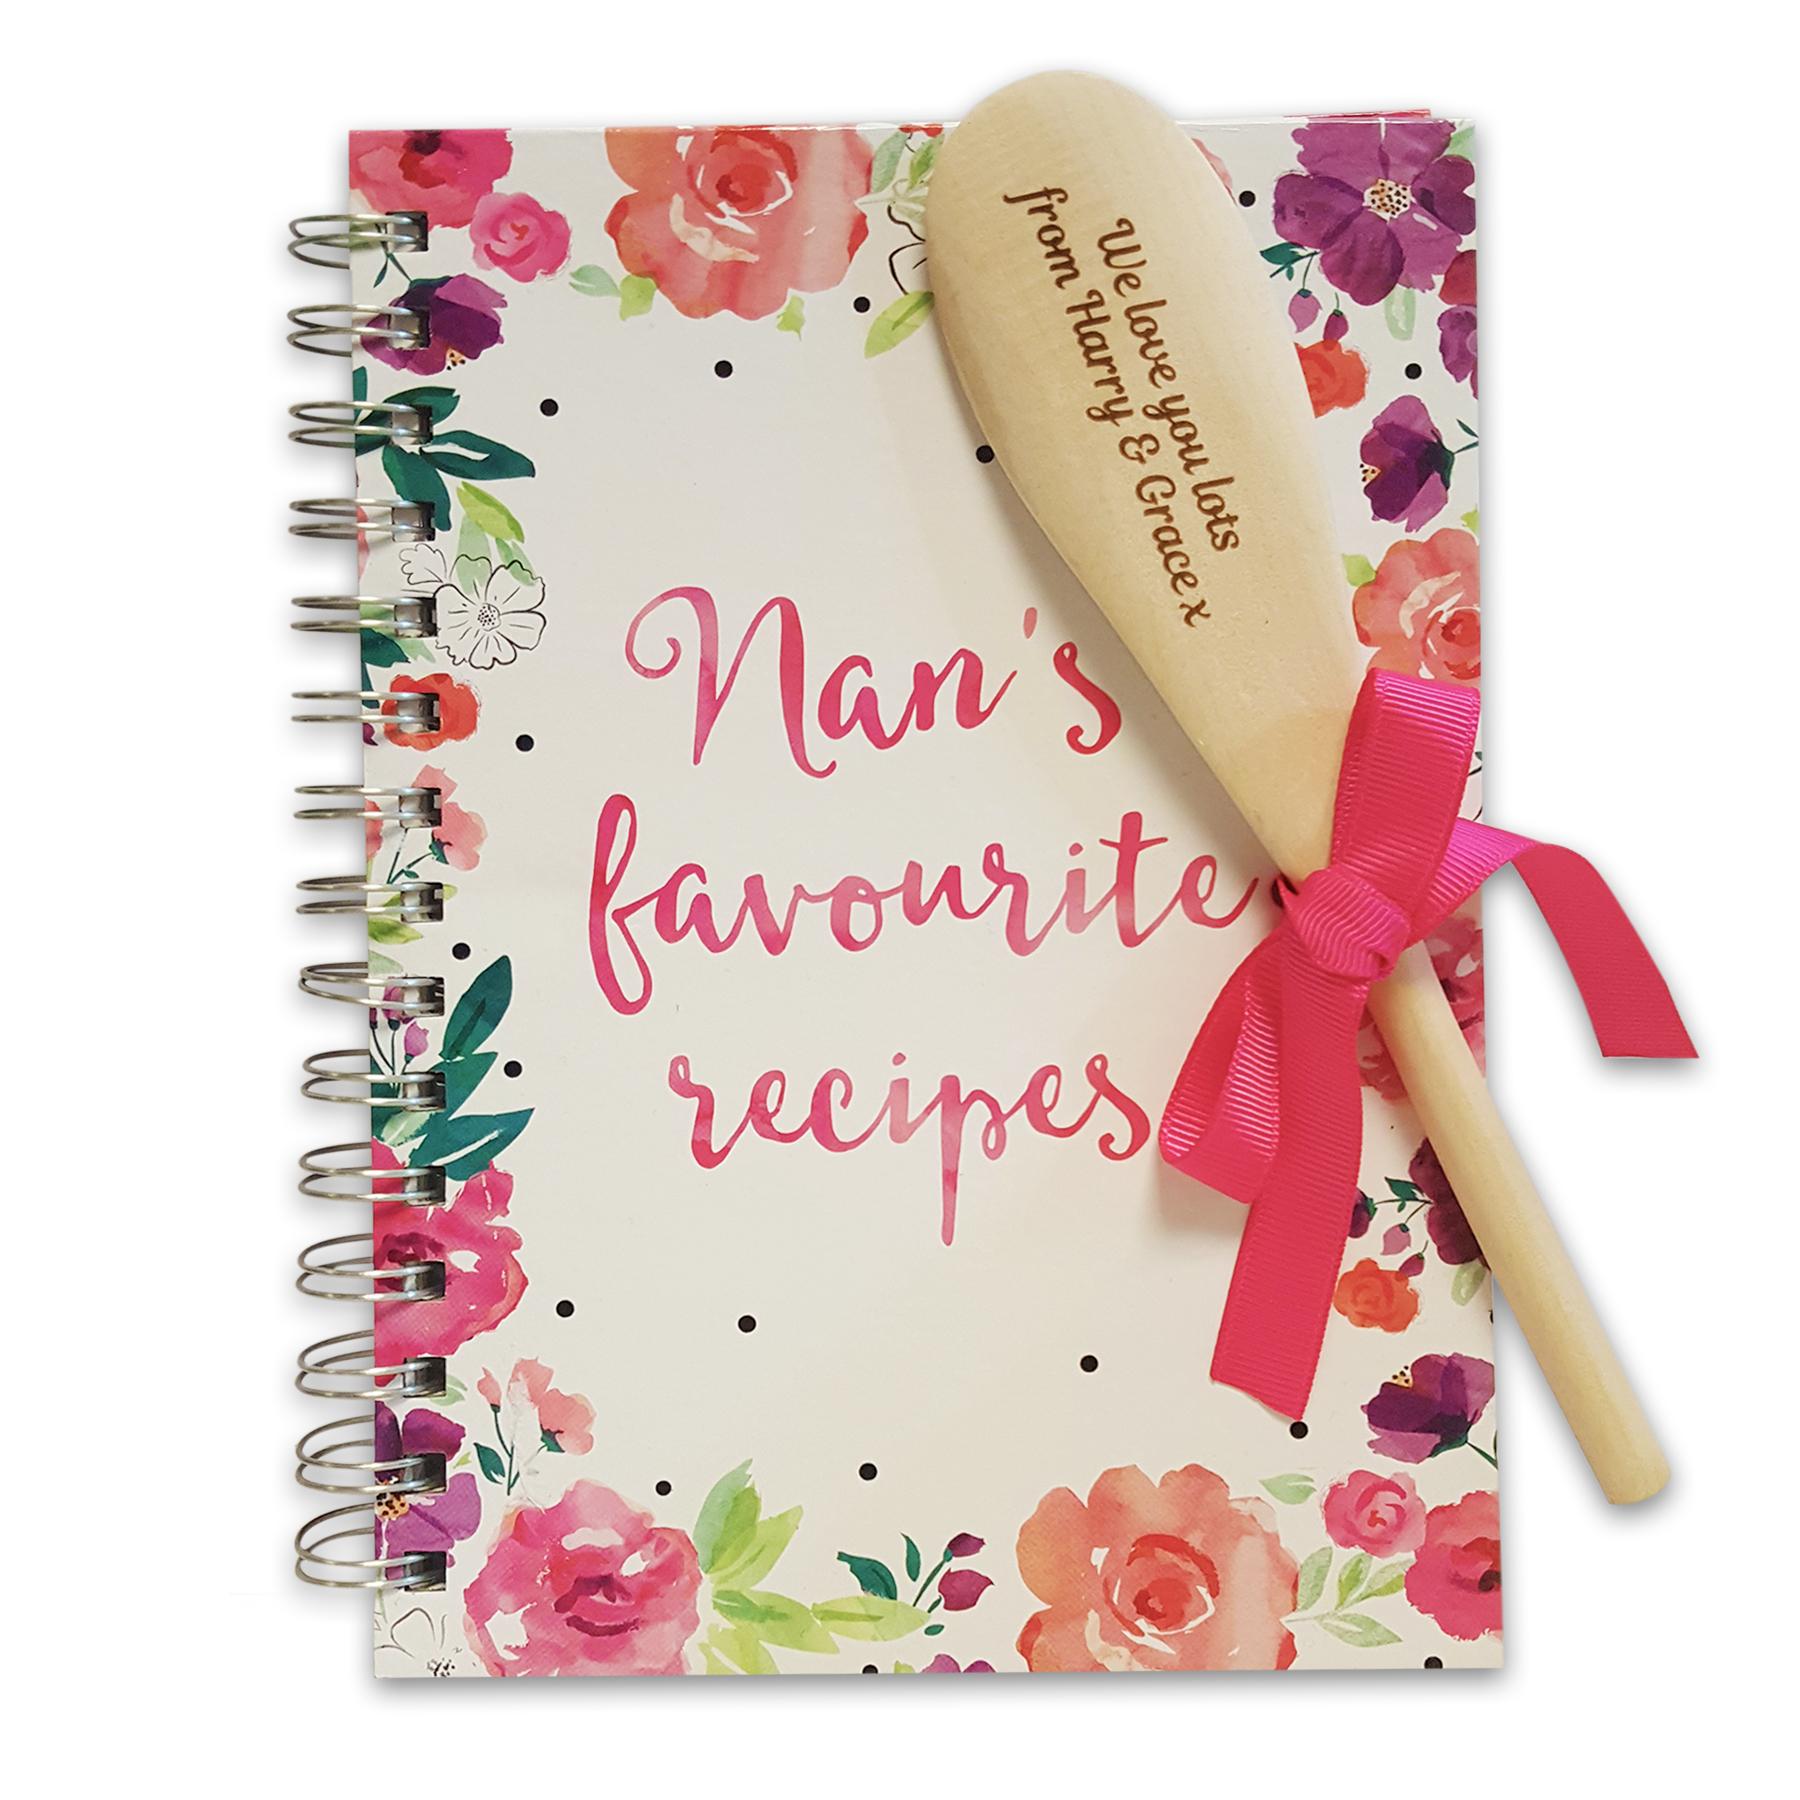 Nan's Favourite Recipe Book and Spoon